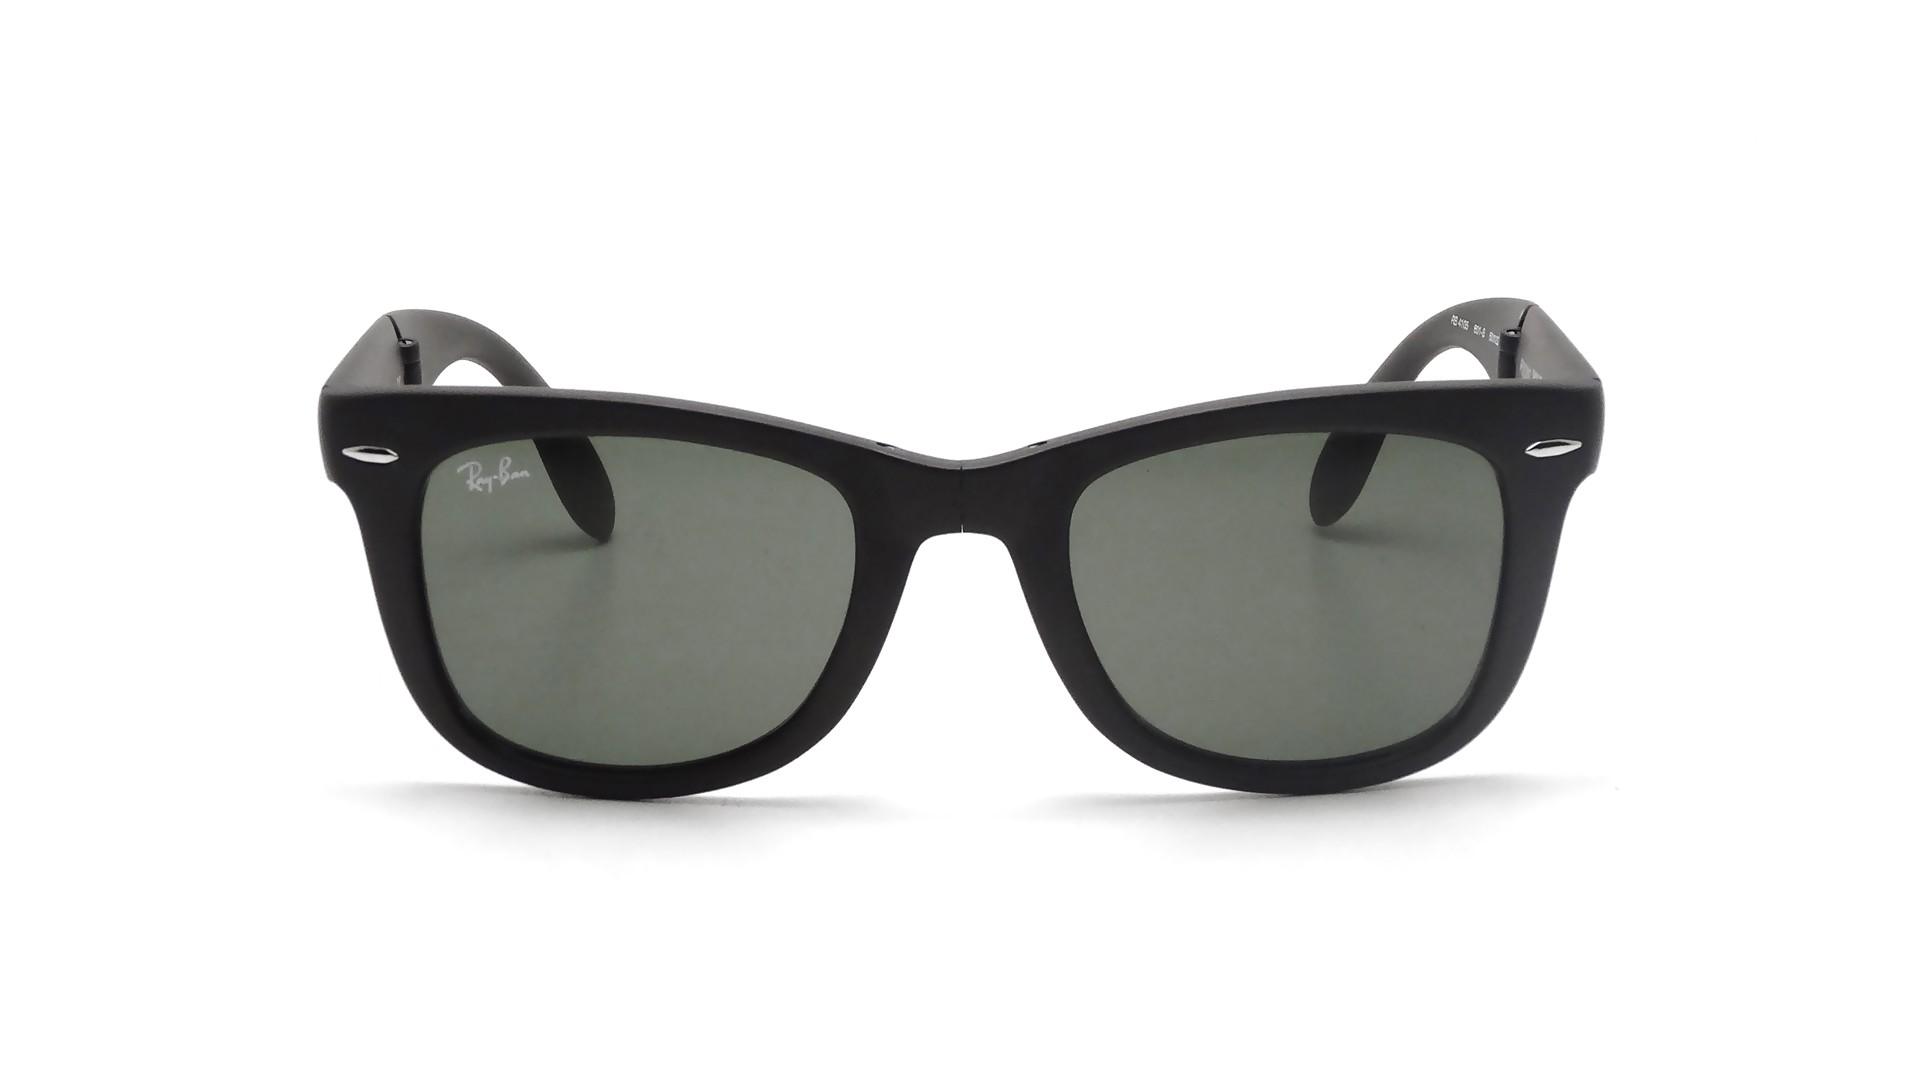 5f50b8b653a ... coupon code for ray ban original wayfarer black rb4105 601 58 50 22  pliantes polarisés visiofactory